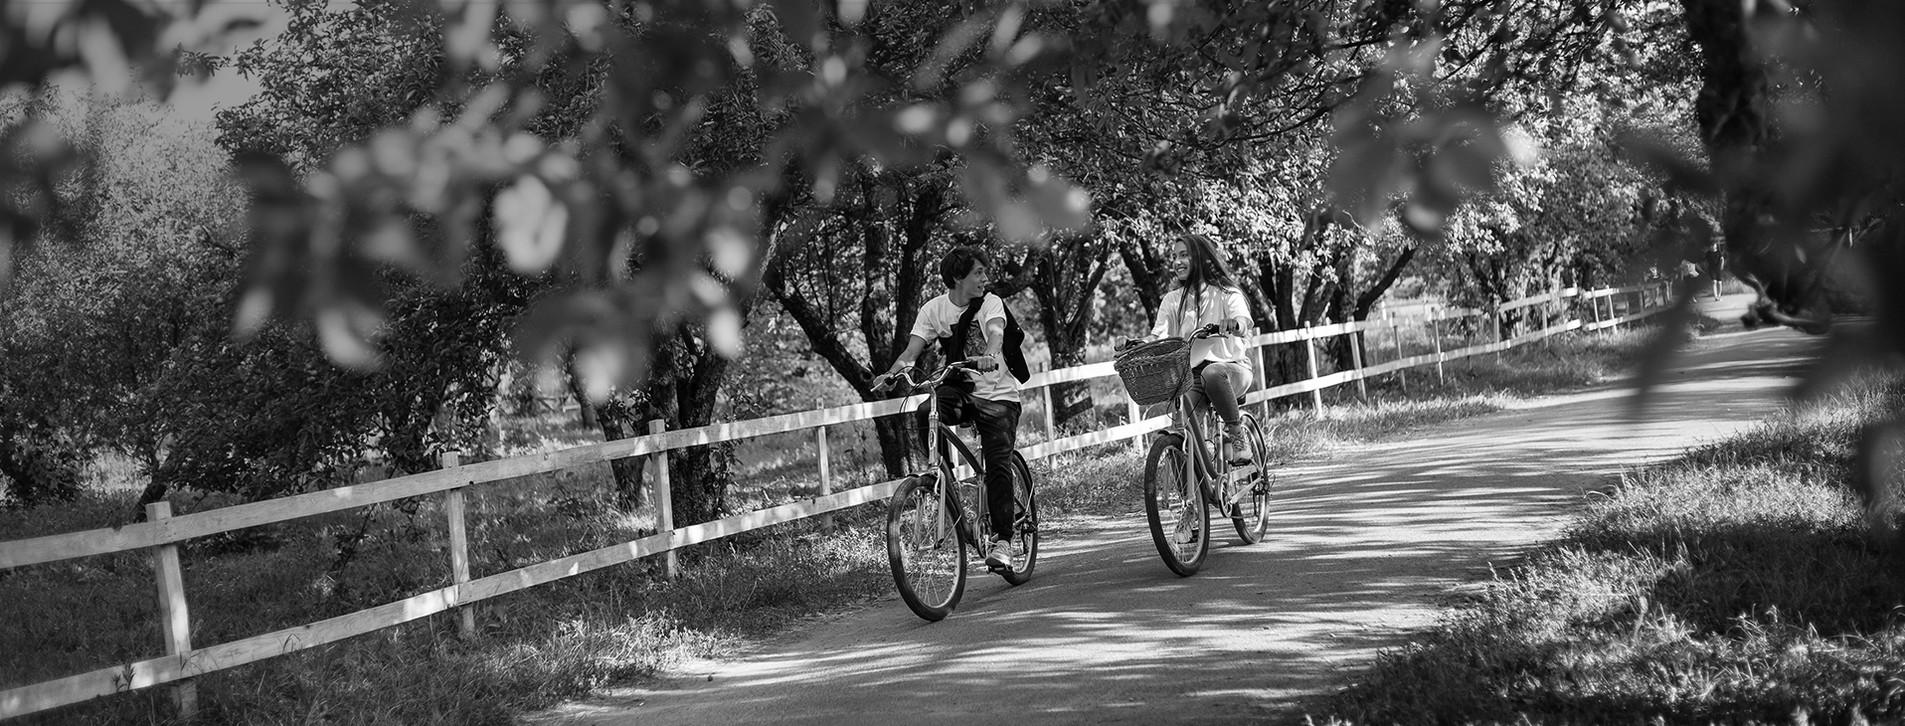 Фото 1 - Прогулка на круизерах для двоих